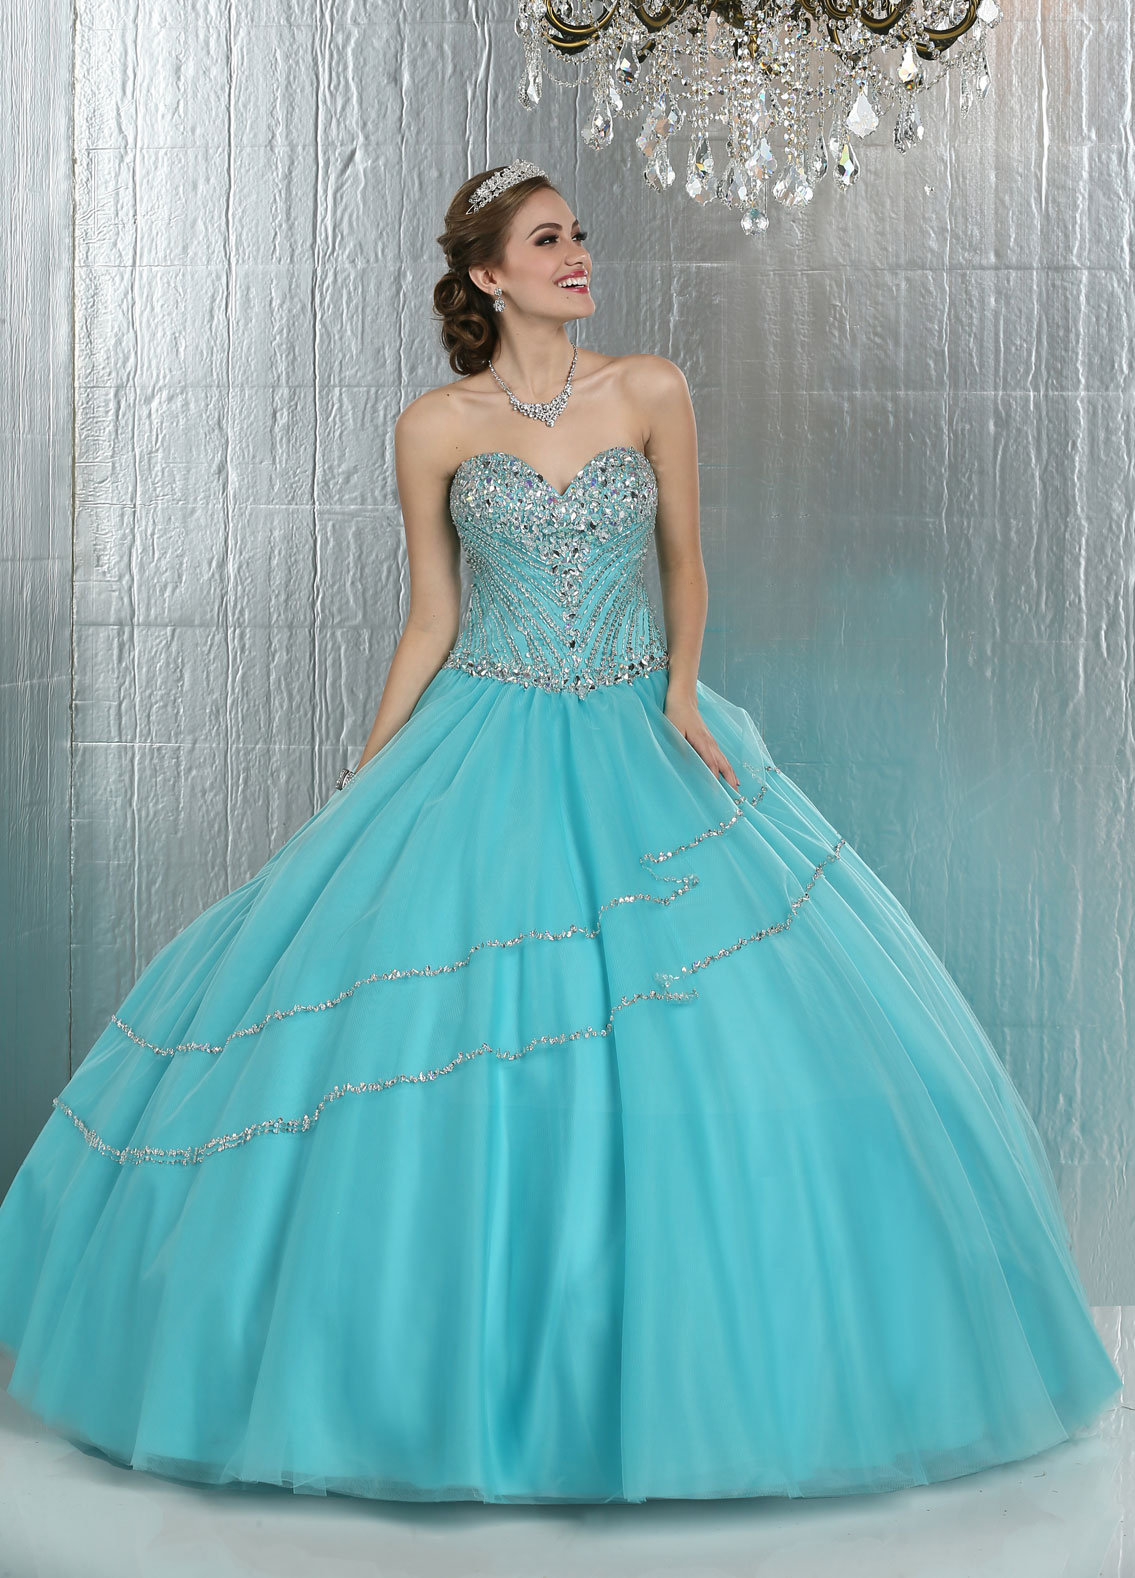 De Novo Formal Dresses - Quinceanera Directory